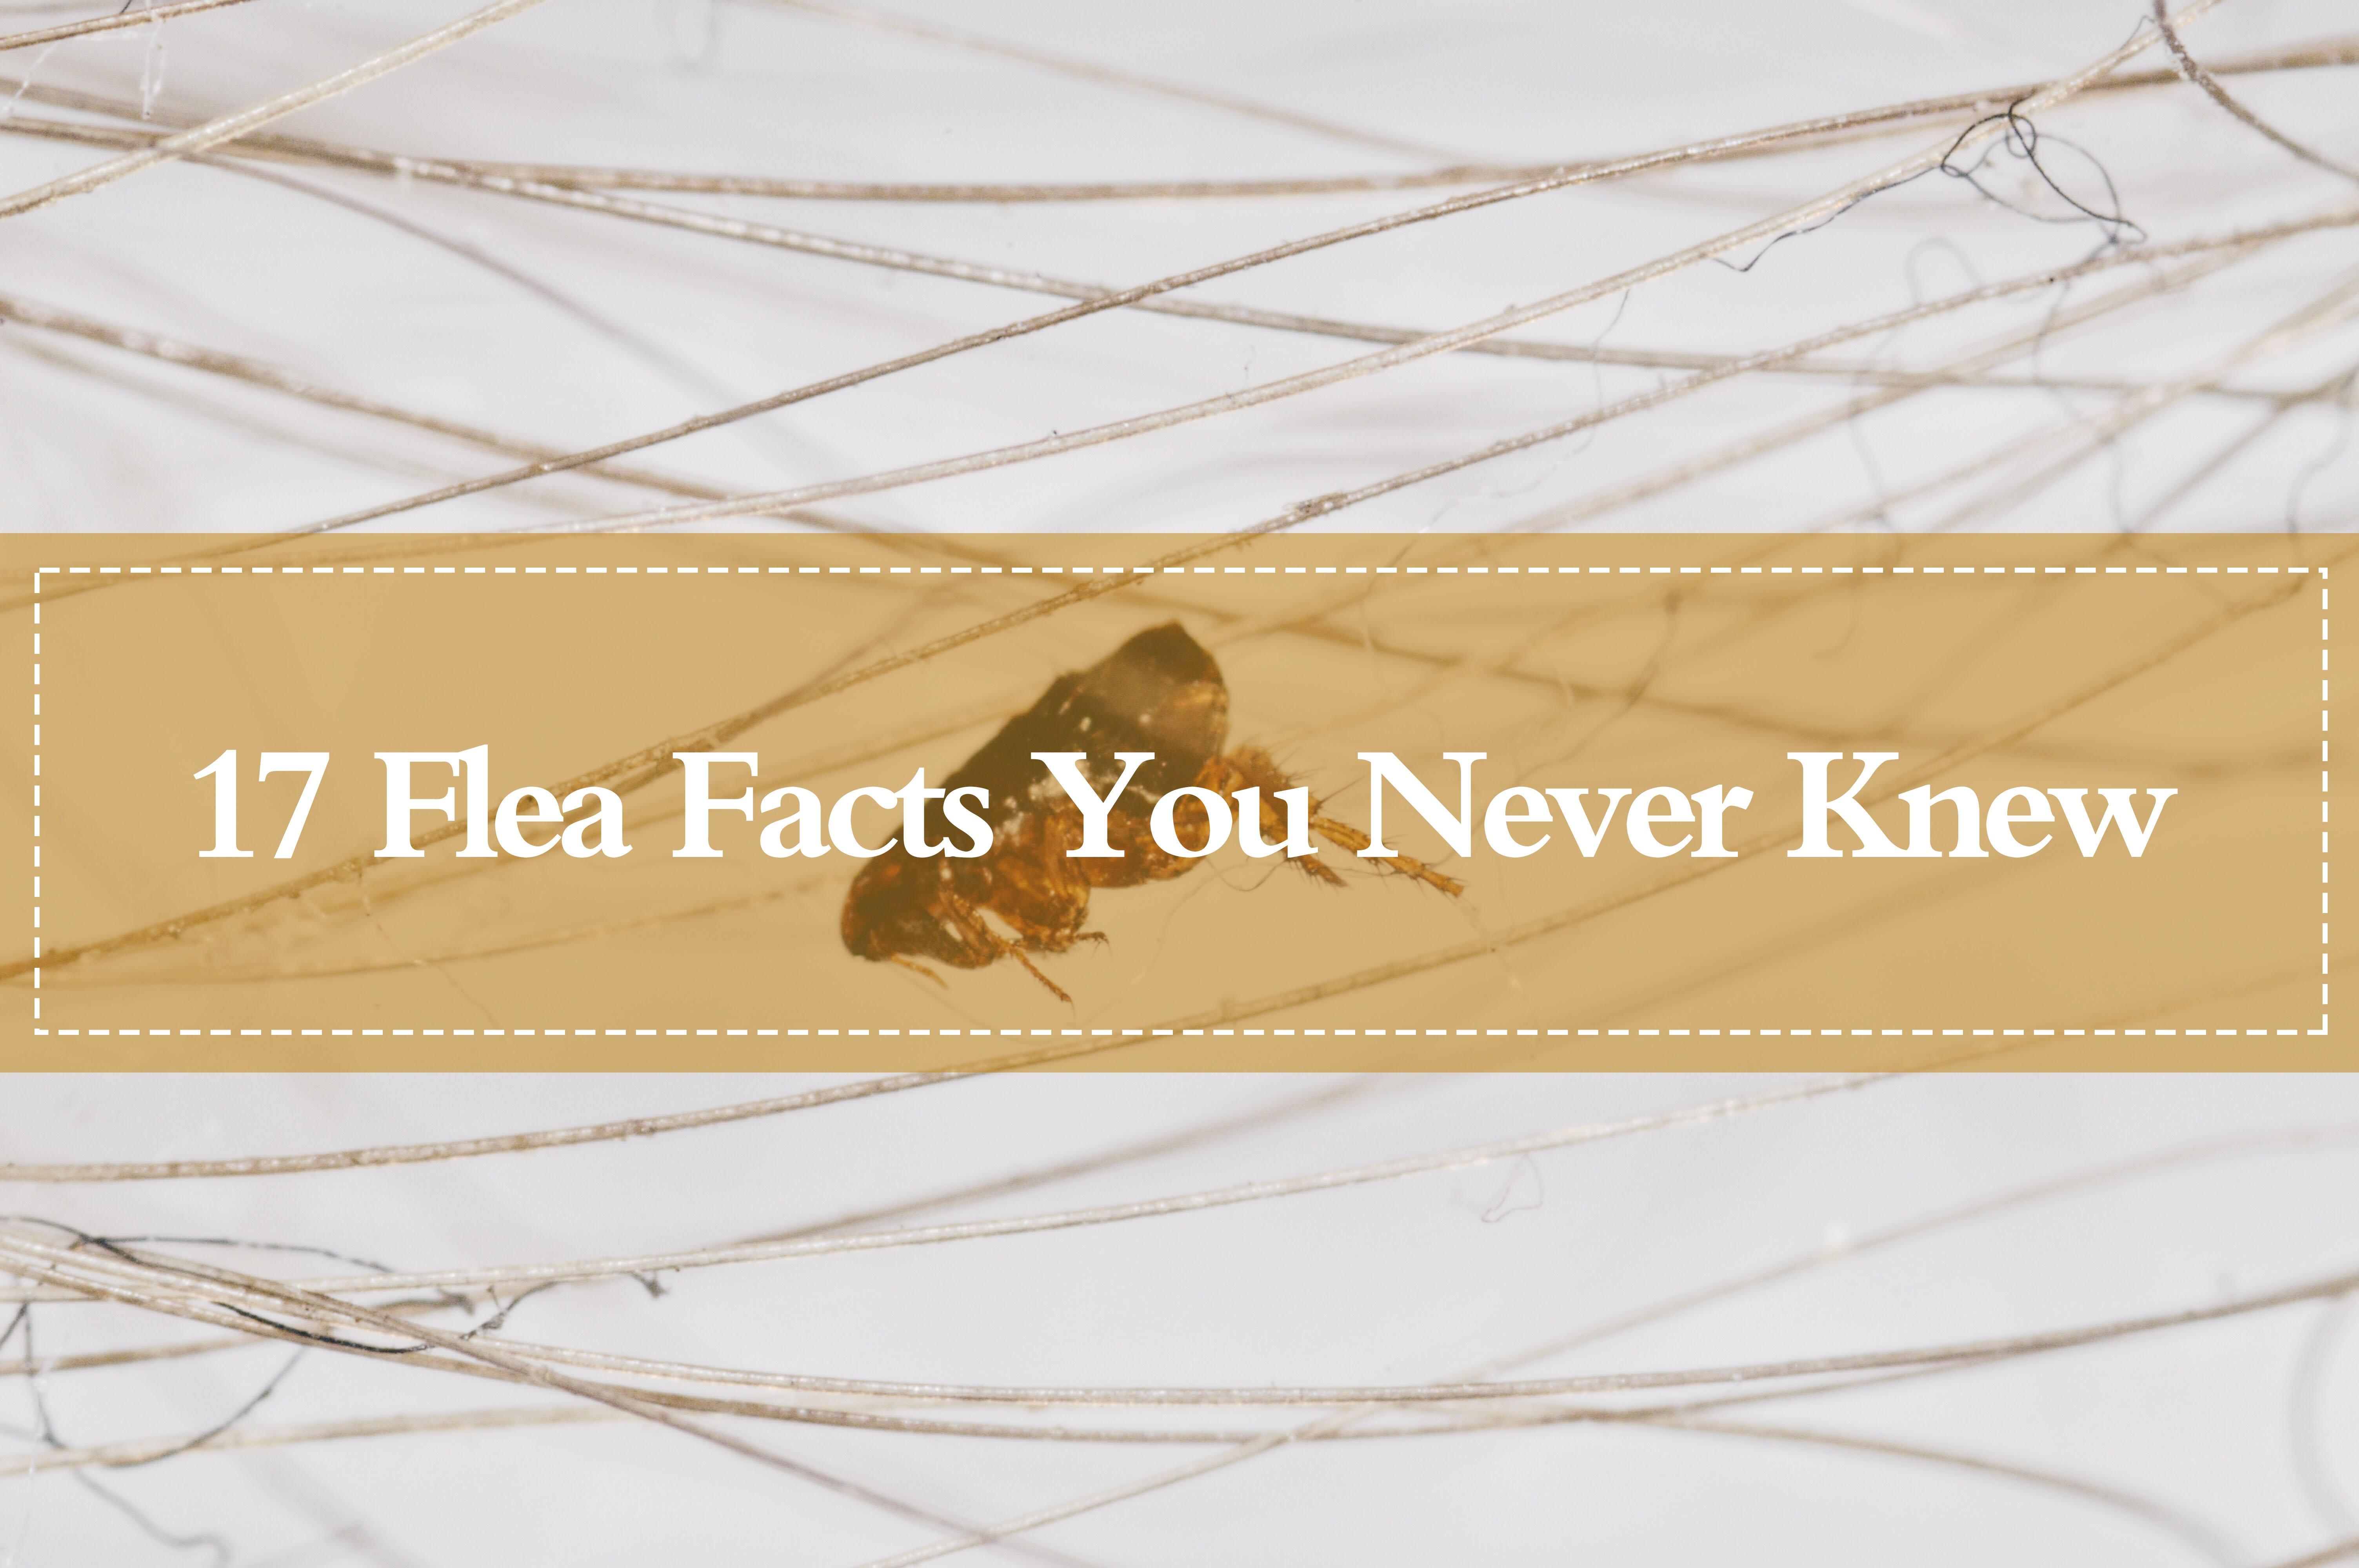 17 Flea Facts